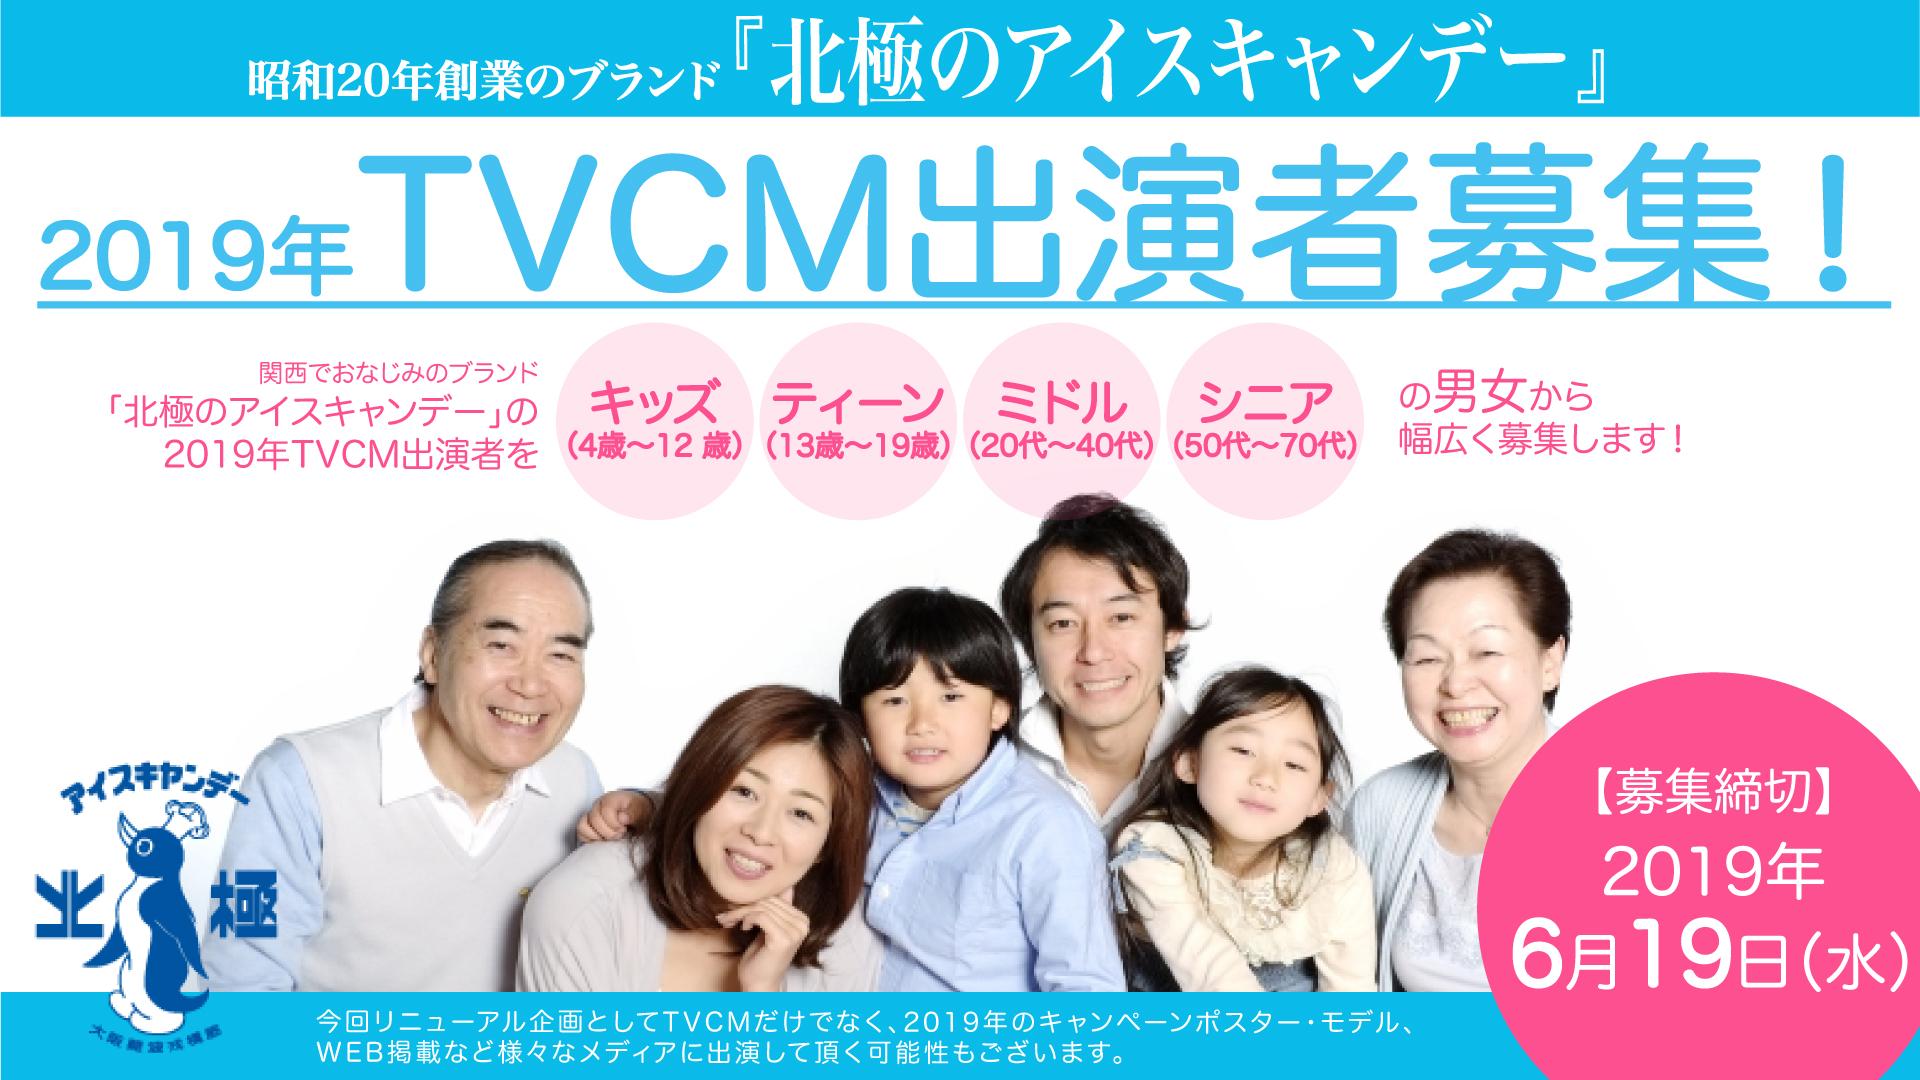 【CM完成】『北極のアイスキャンデー2019(夏の想い出編)』WEB-CM※東京チーム制作